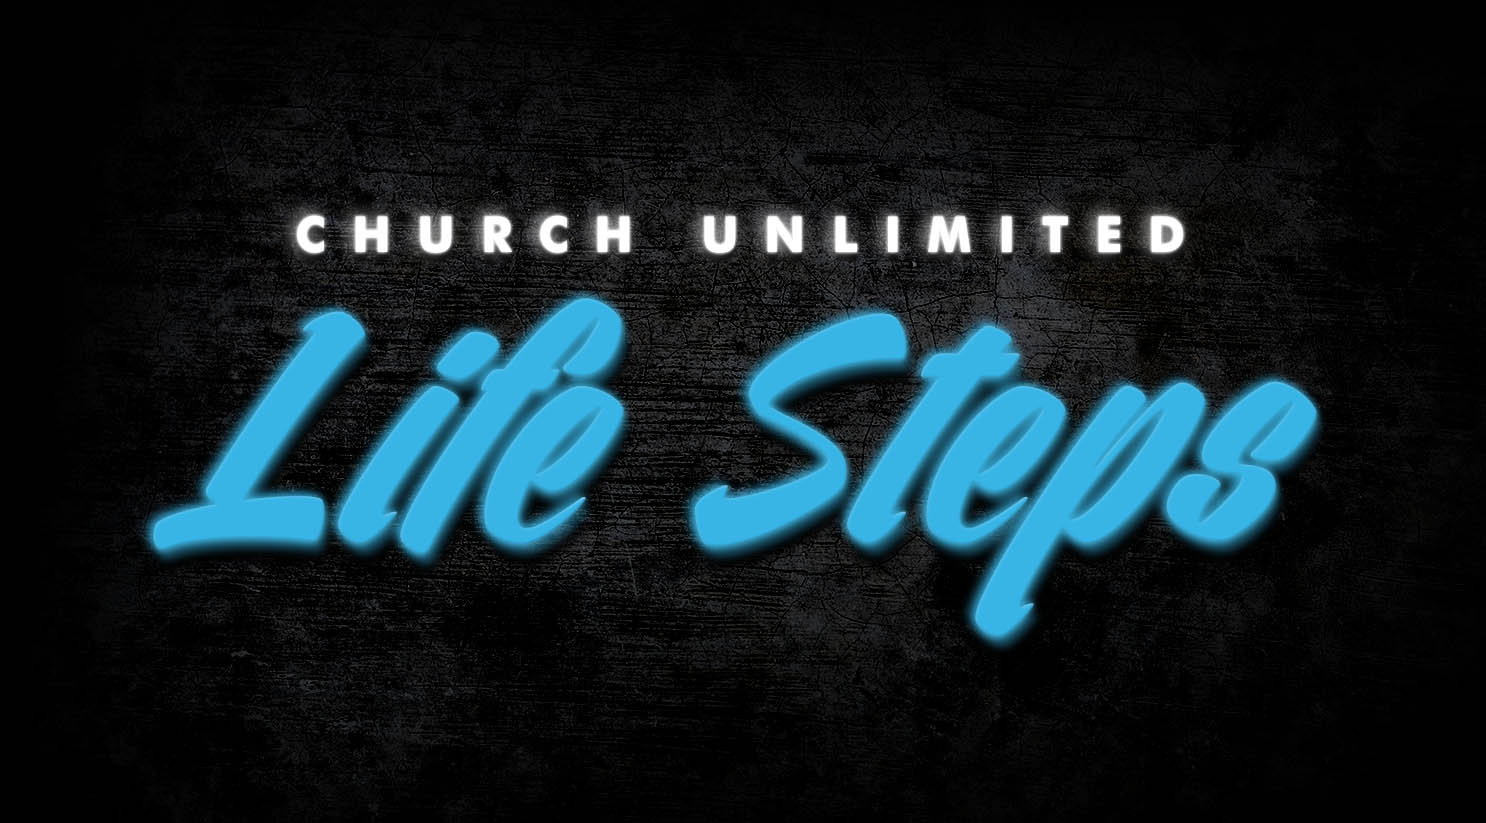 Life steps new